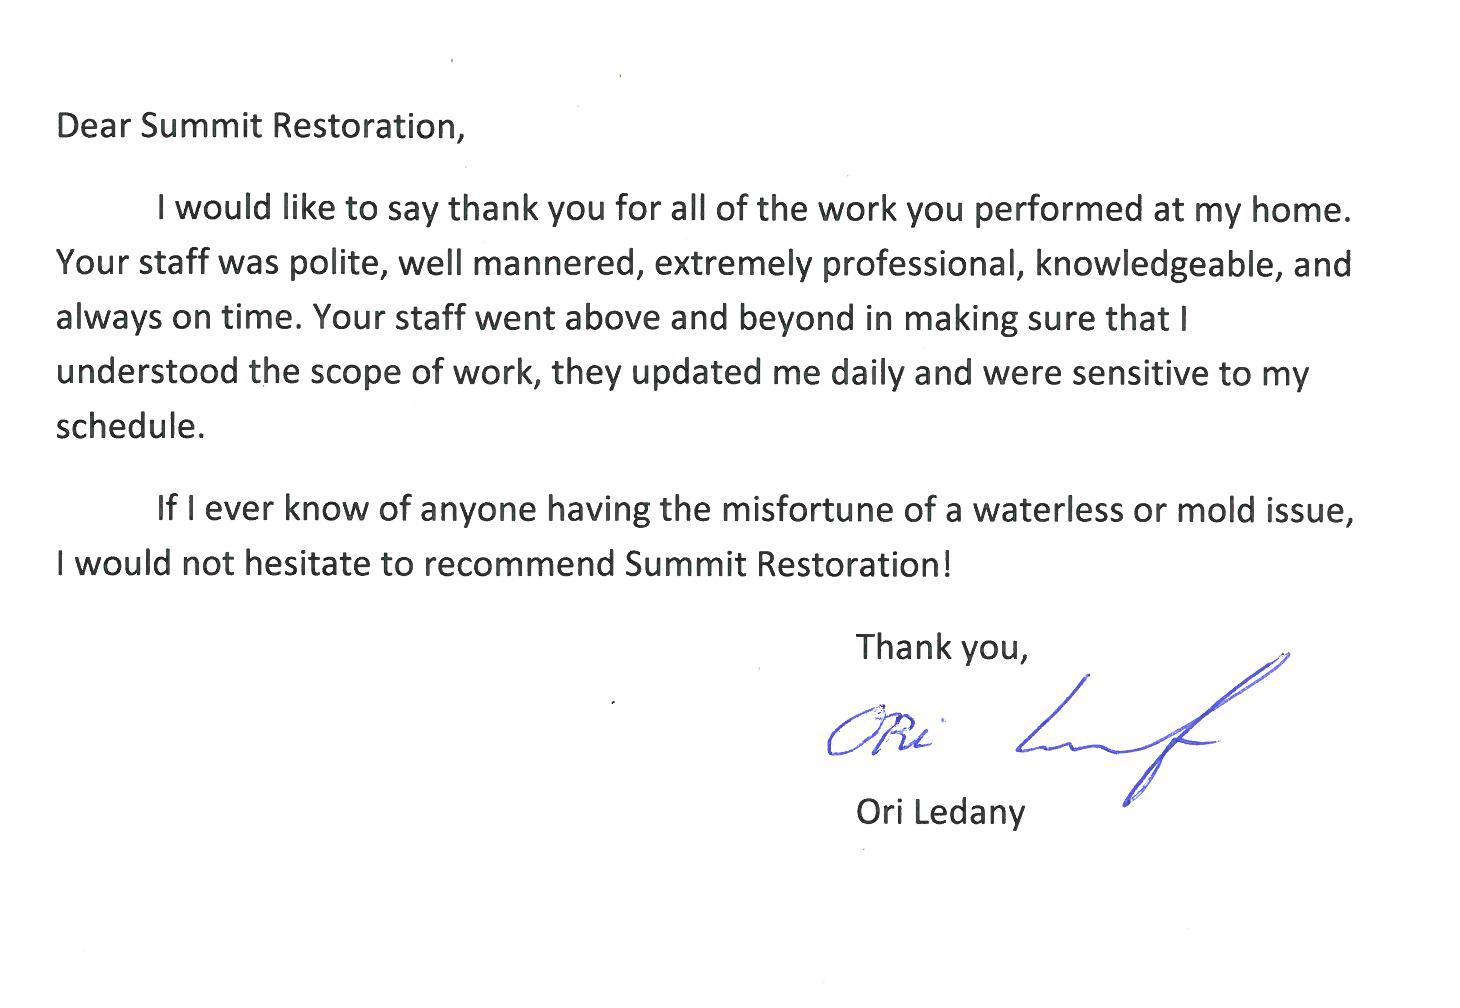 Testimonial from Ori Ledany